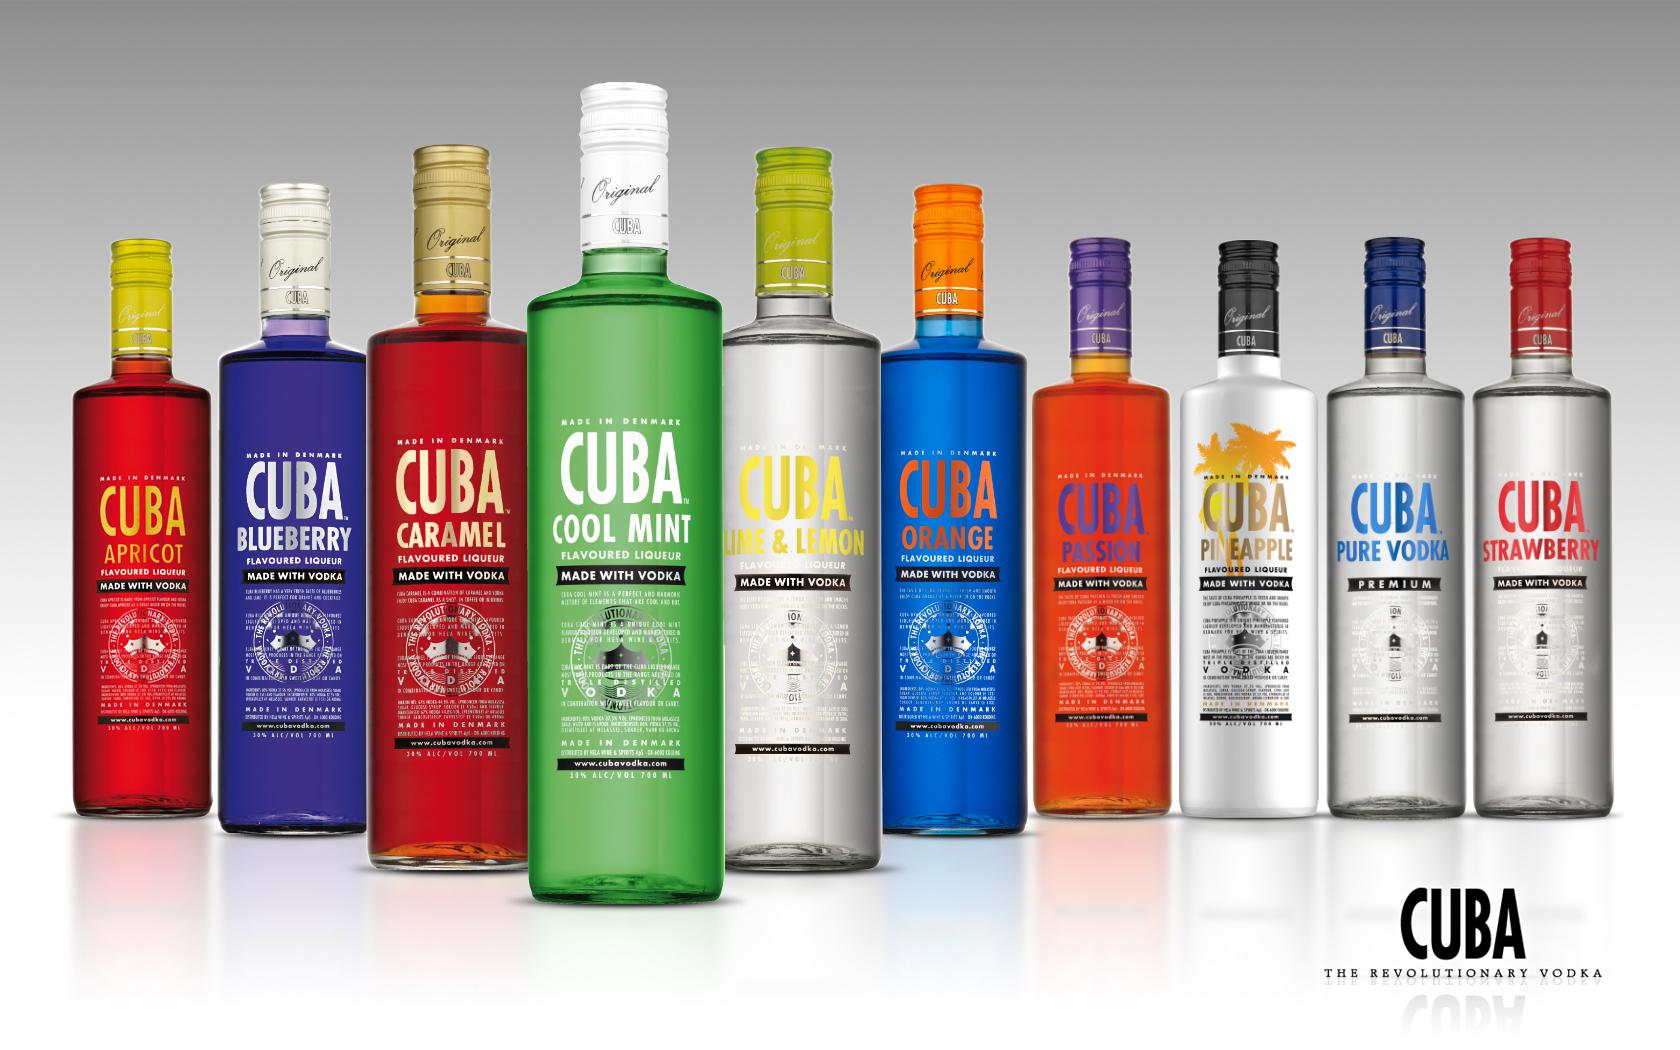 Cuba Vodka | DrinksMeister - Drinks & Cocktails, Drinksopskrifter, Rom, Gin, Vodka, Tequila